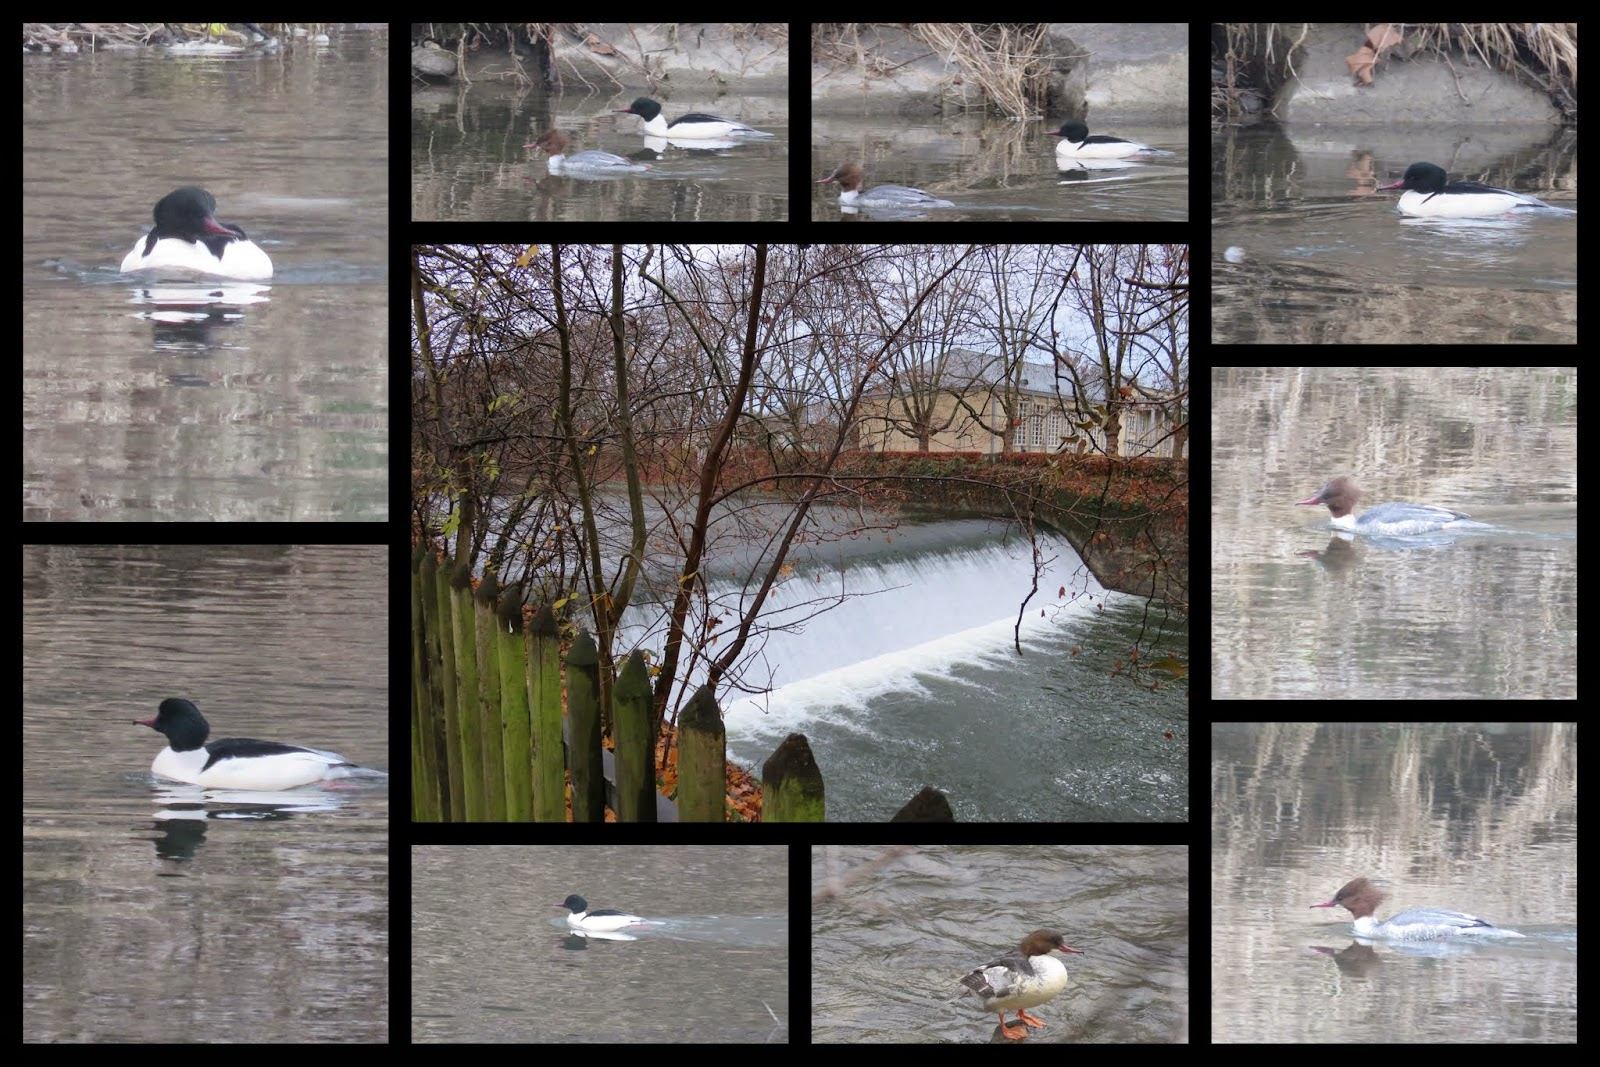 Goosanders - ducks - on the Sihl River in Zurich